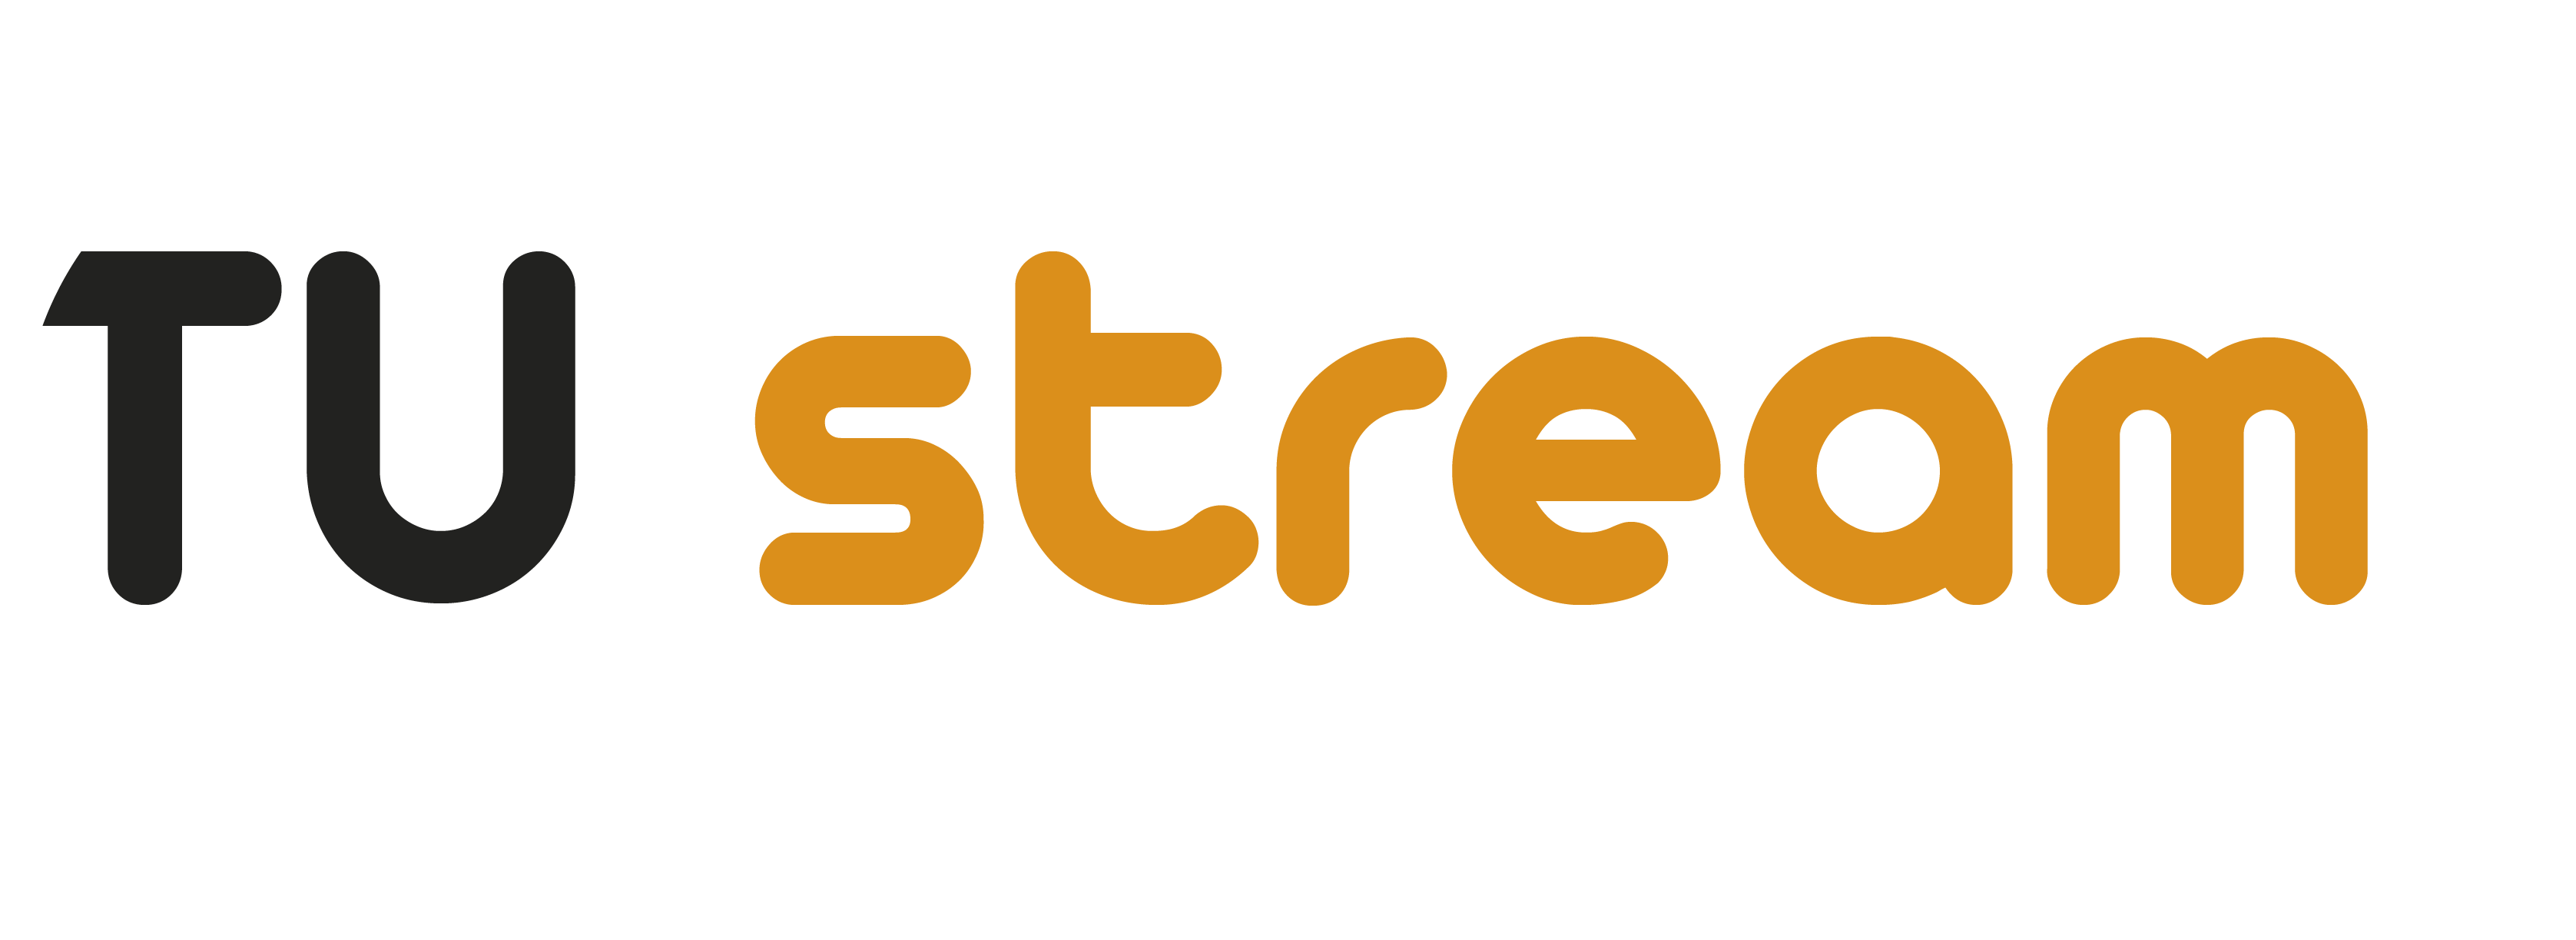 tu stream logo ico